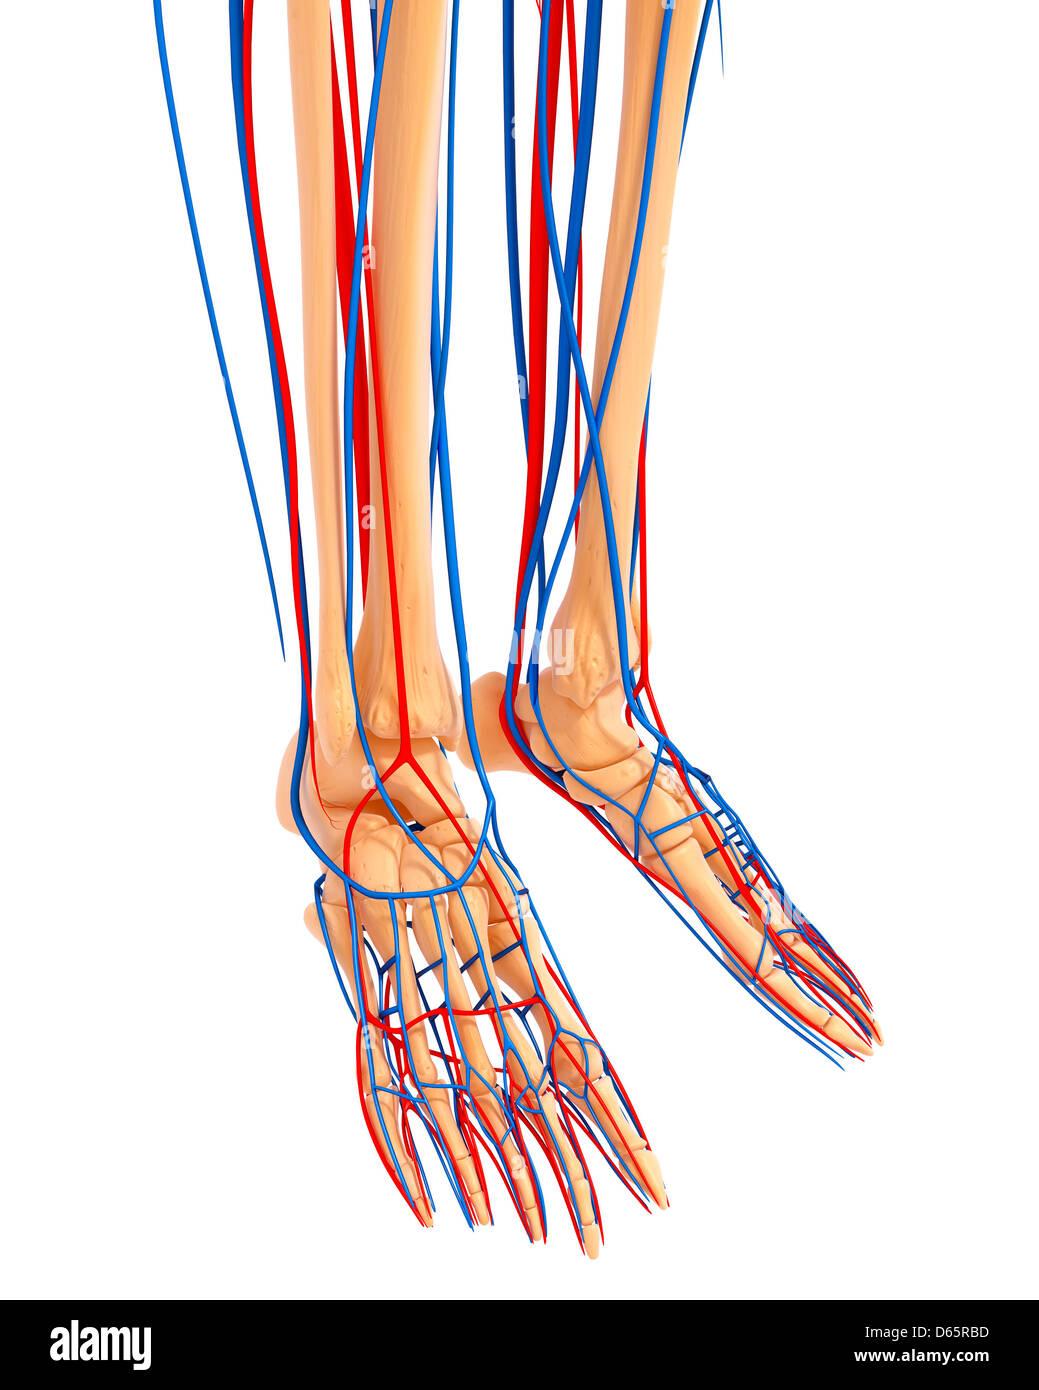 Lower Leg Anatomy Artwork Stock Photo 55447153 Alamy